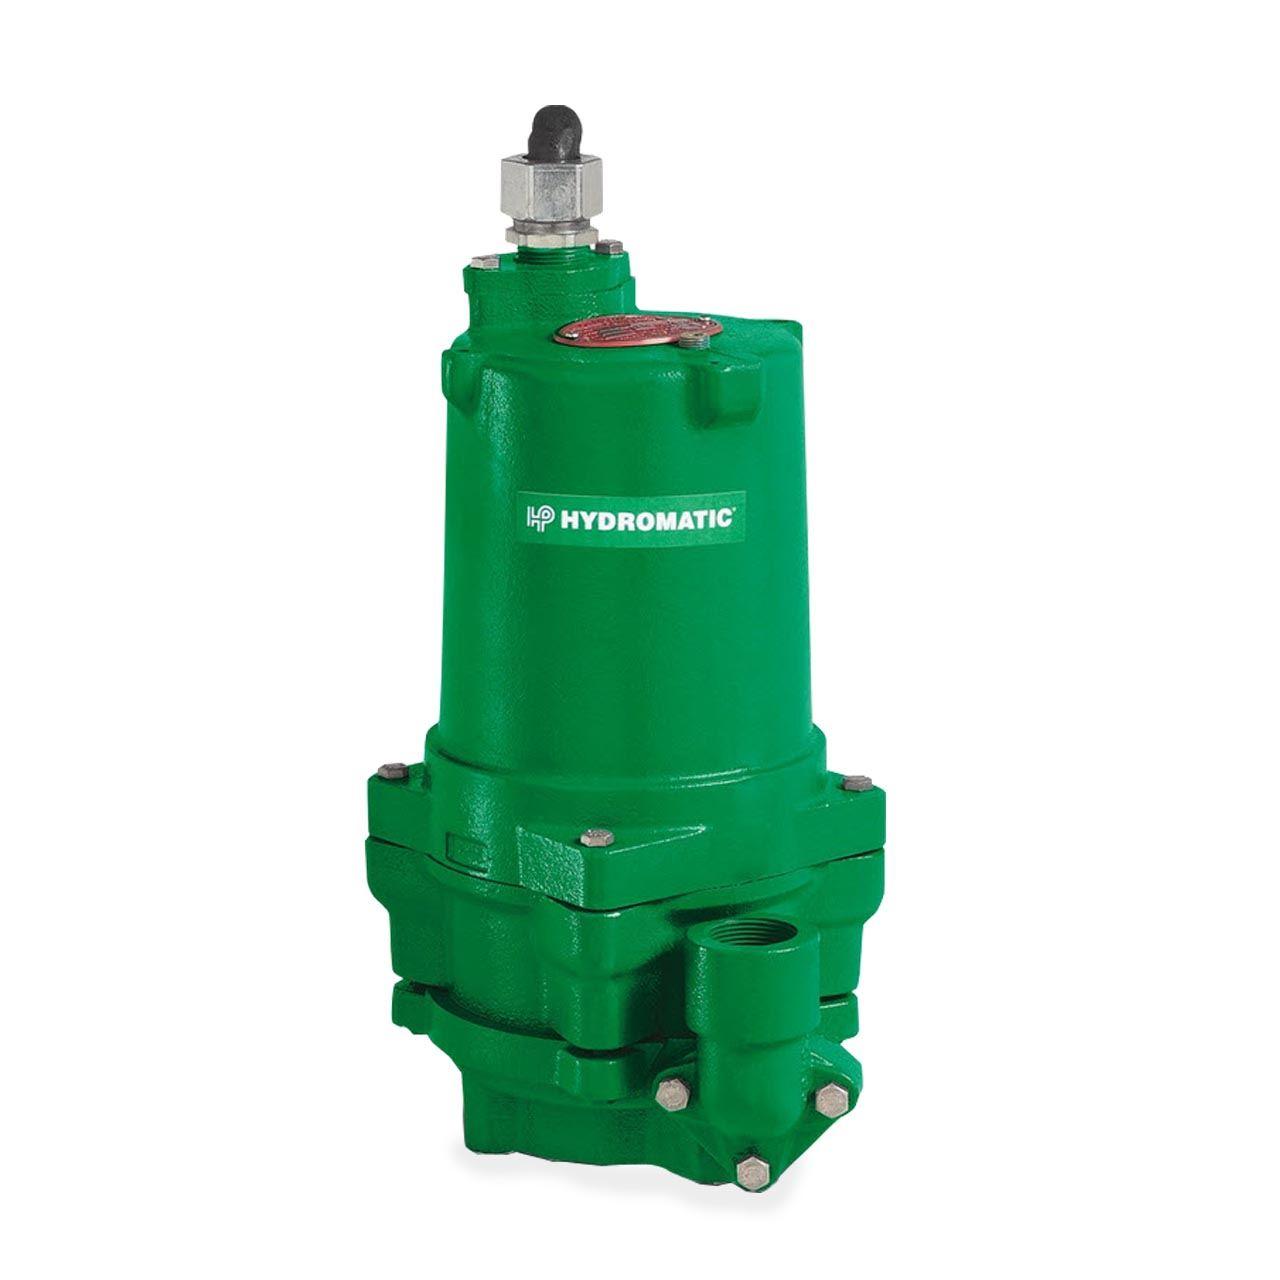 hydromatic pump hydromatic hpg200m2 2 submersible sewage grinder rh rcworst com Payne Heat Pump Wiring Diagram A O. Smith Well Pump Parts Diagram